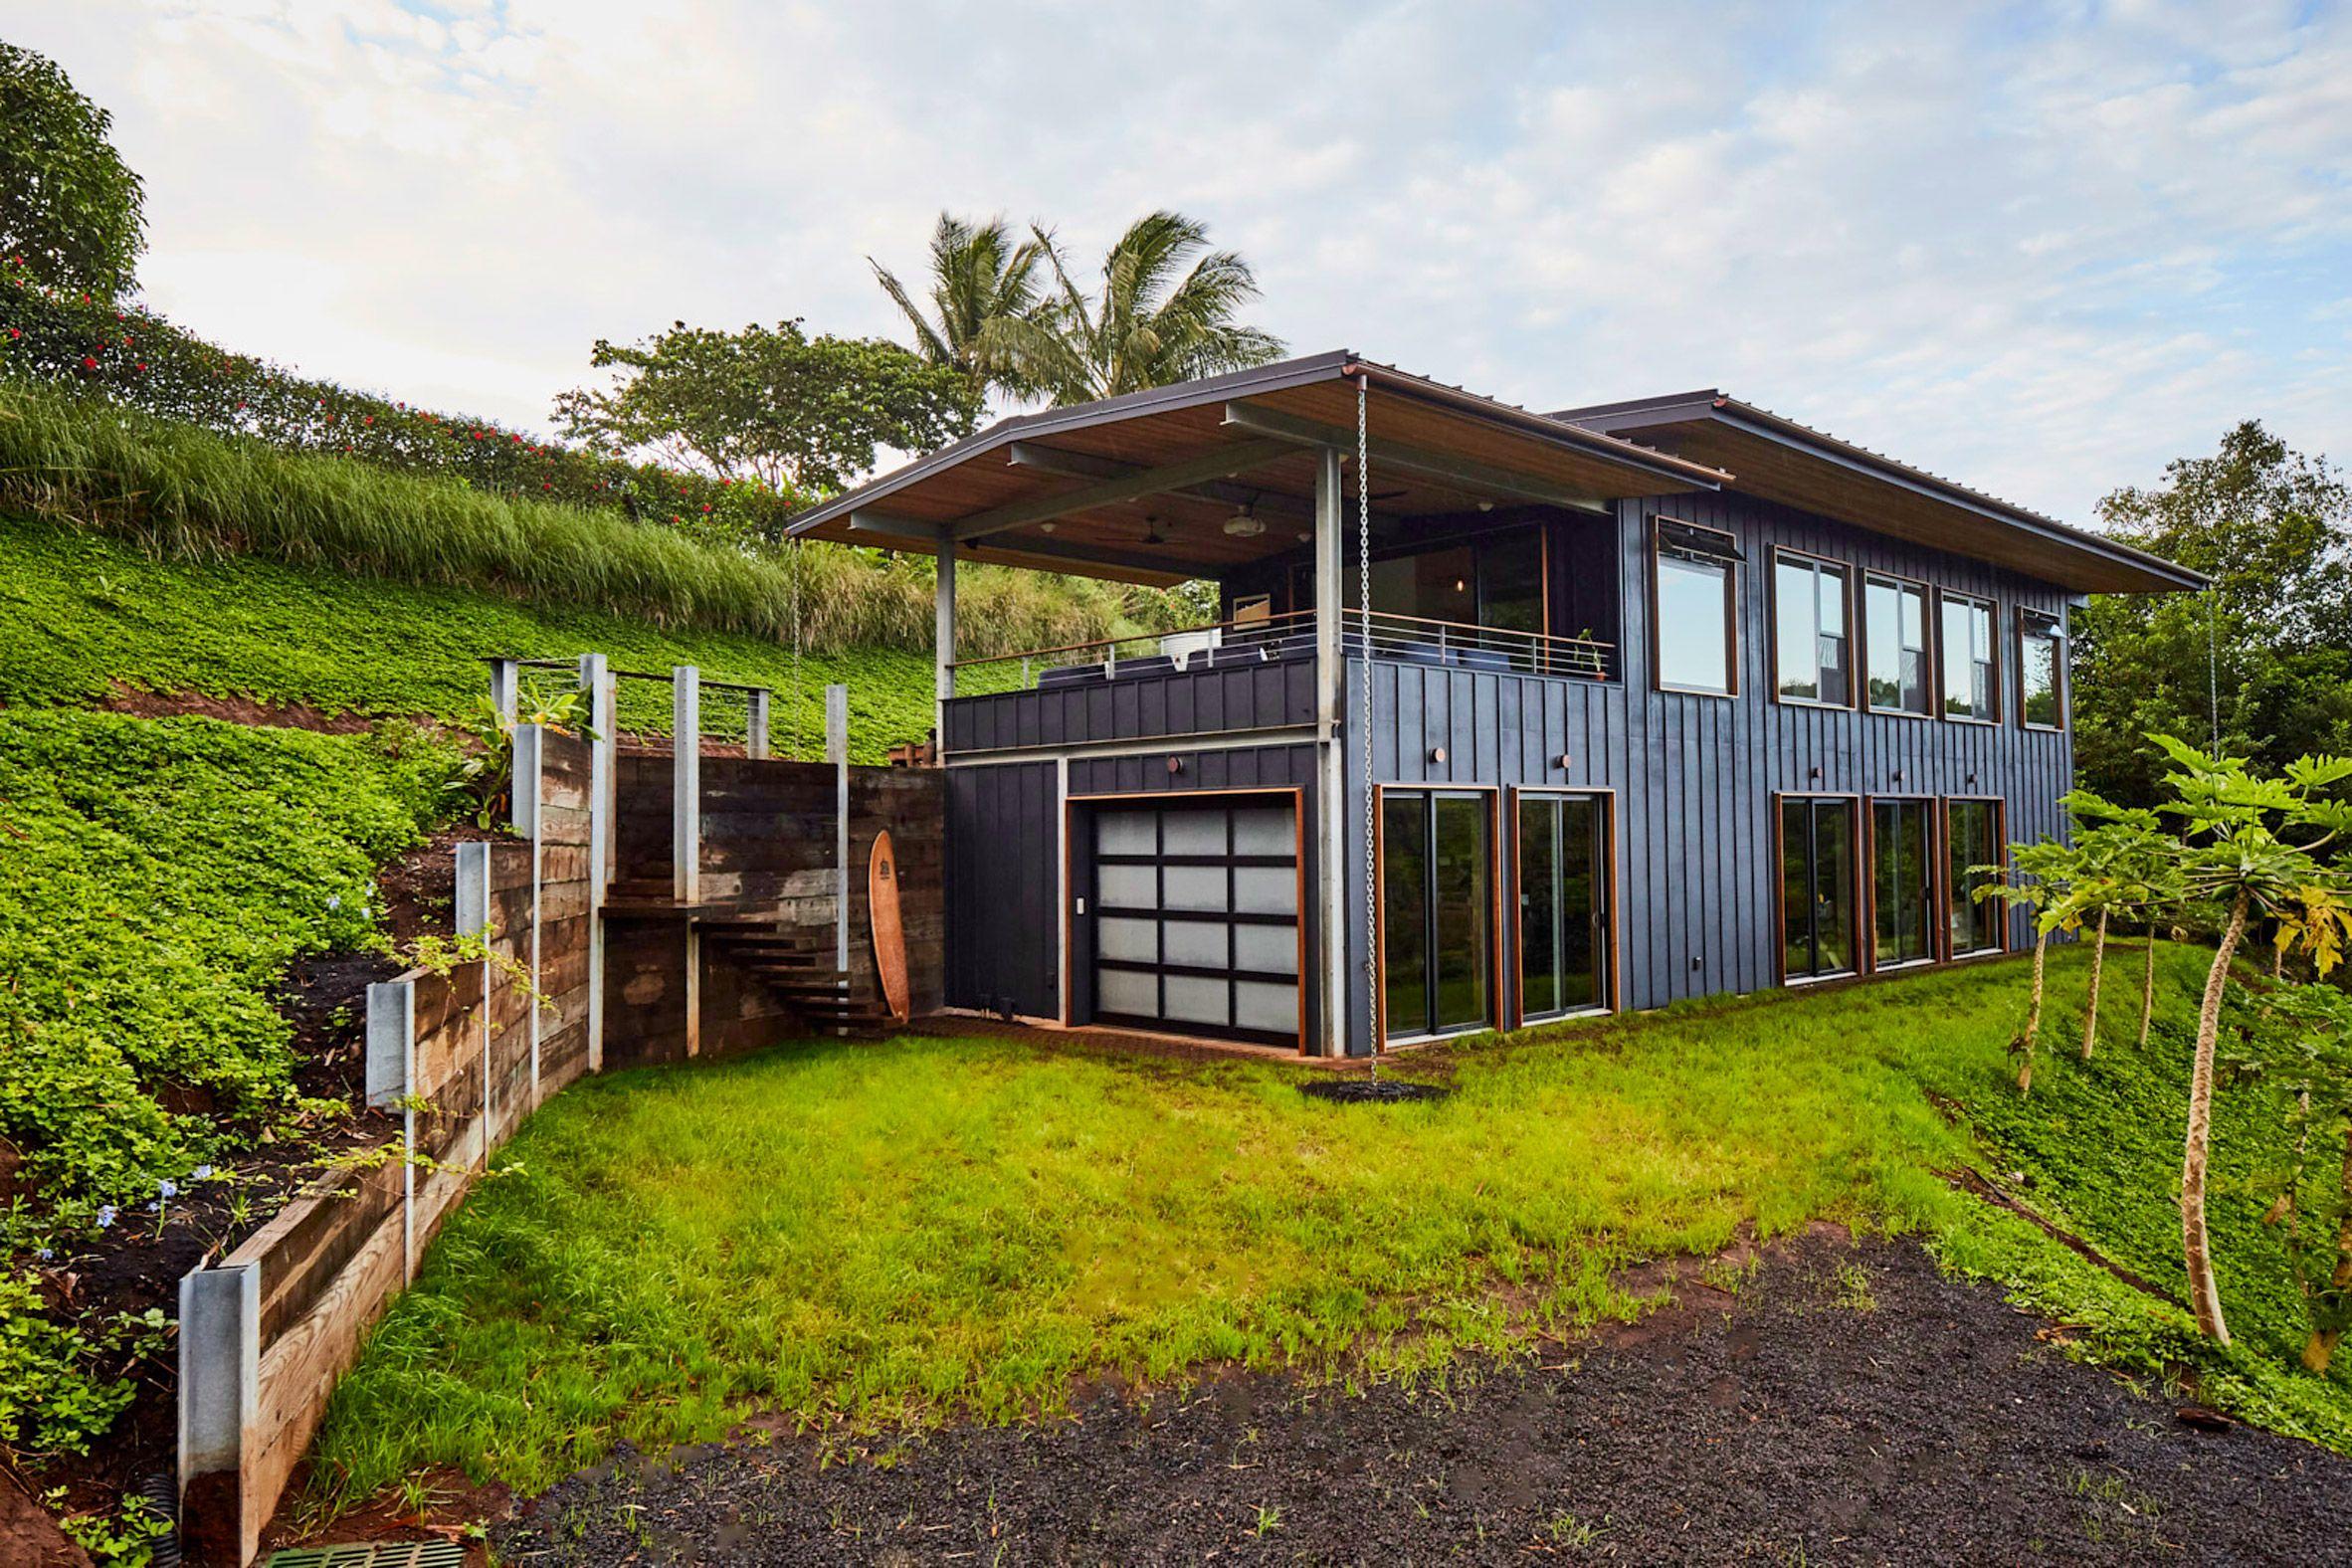 Hawaiian House By Lifeedited Harvests More Energy And Water Than It Consumes Hawaiian Homes Hawaii Homes Off Grid House